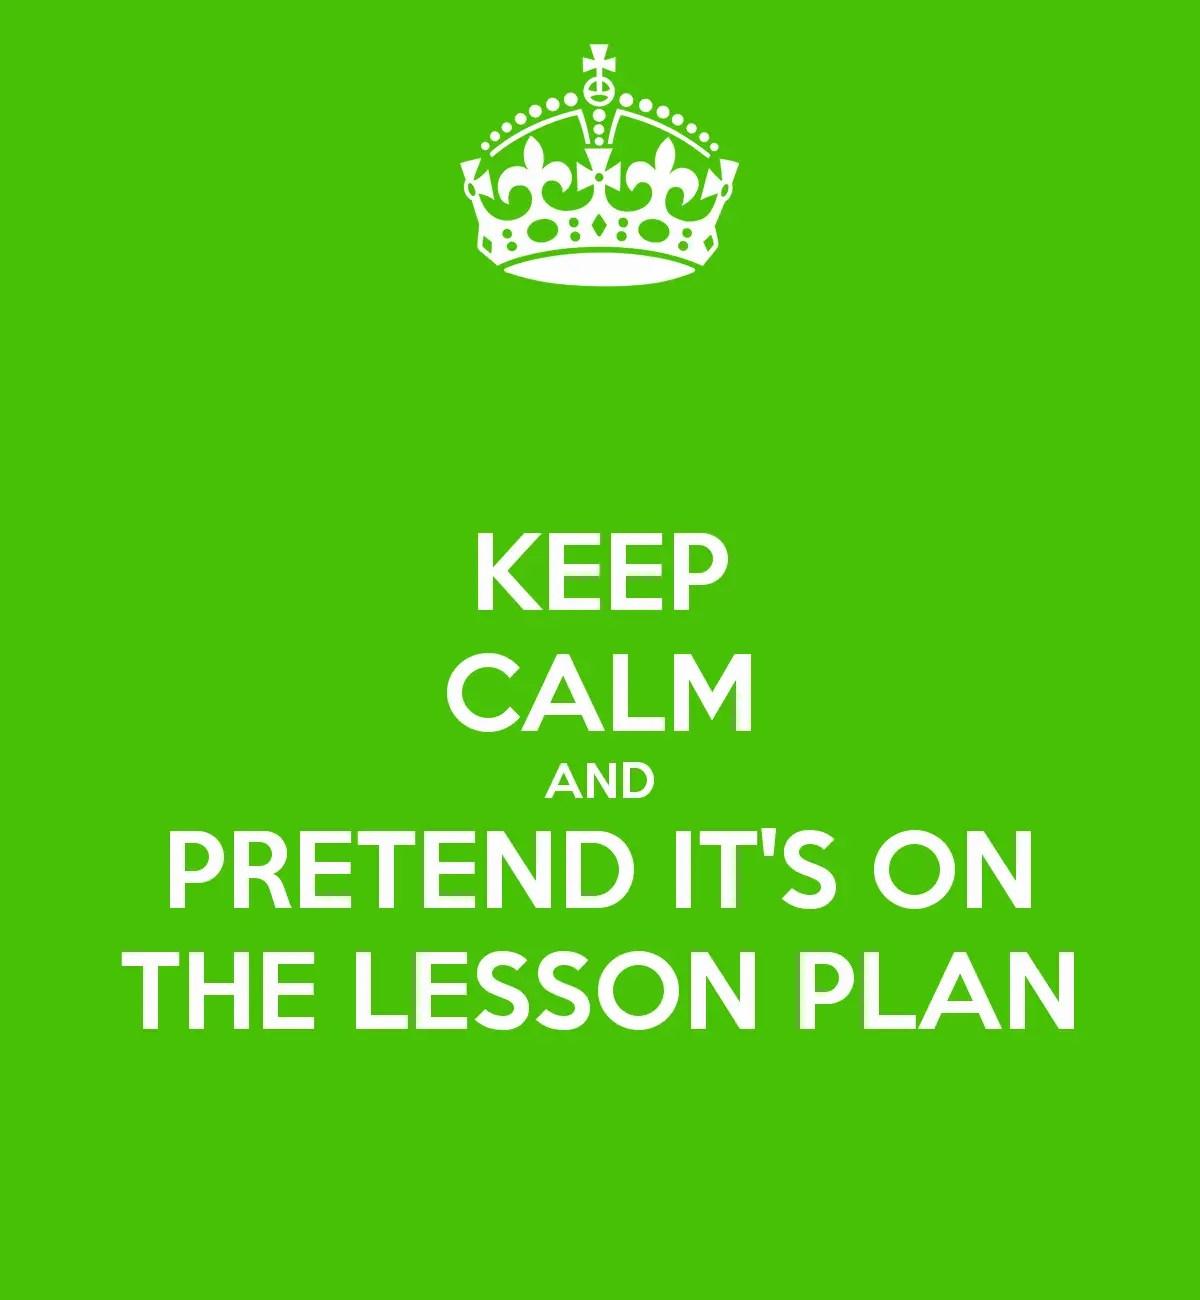 Esl Lesson Plans Esl Speaking